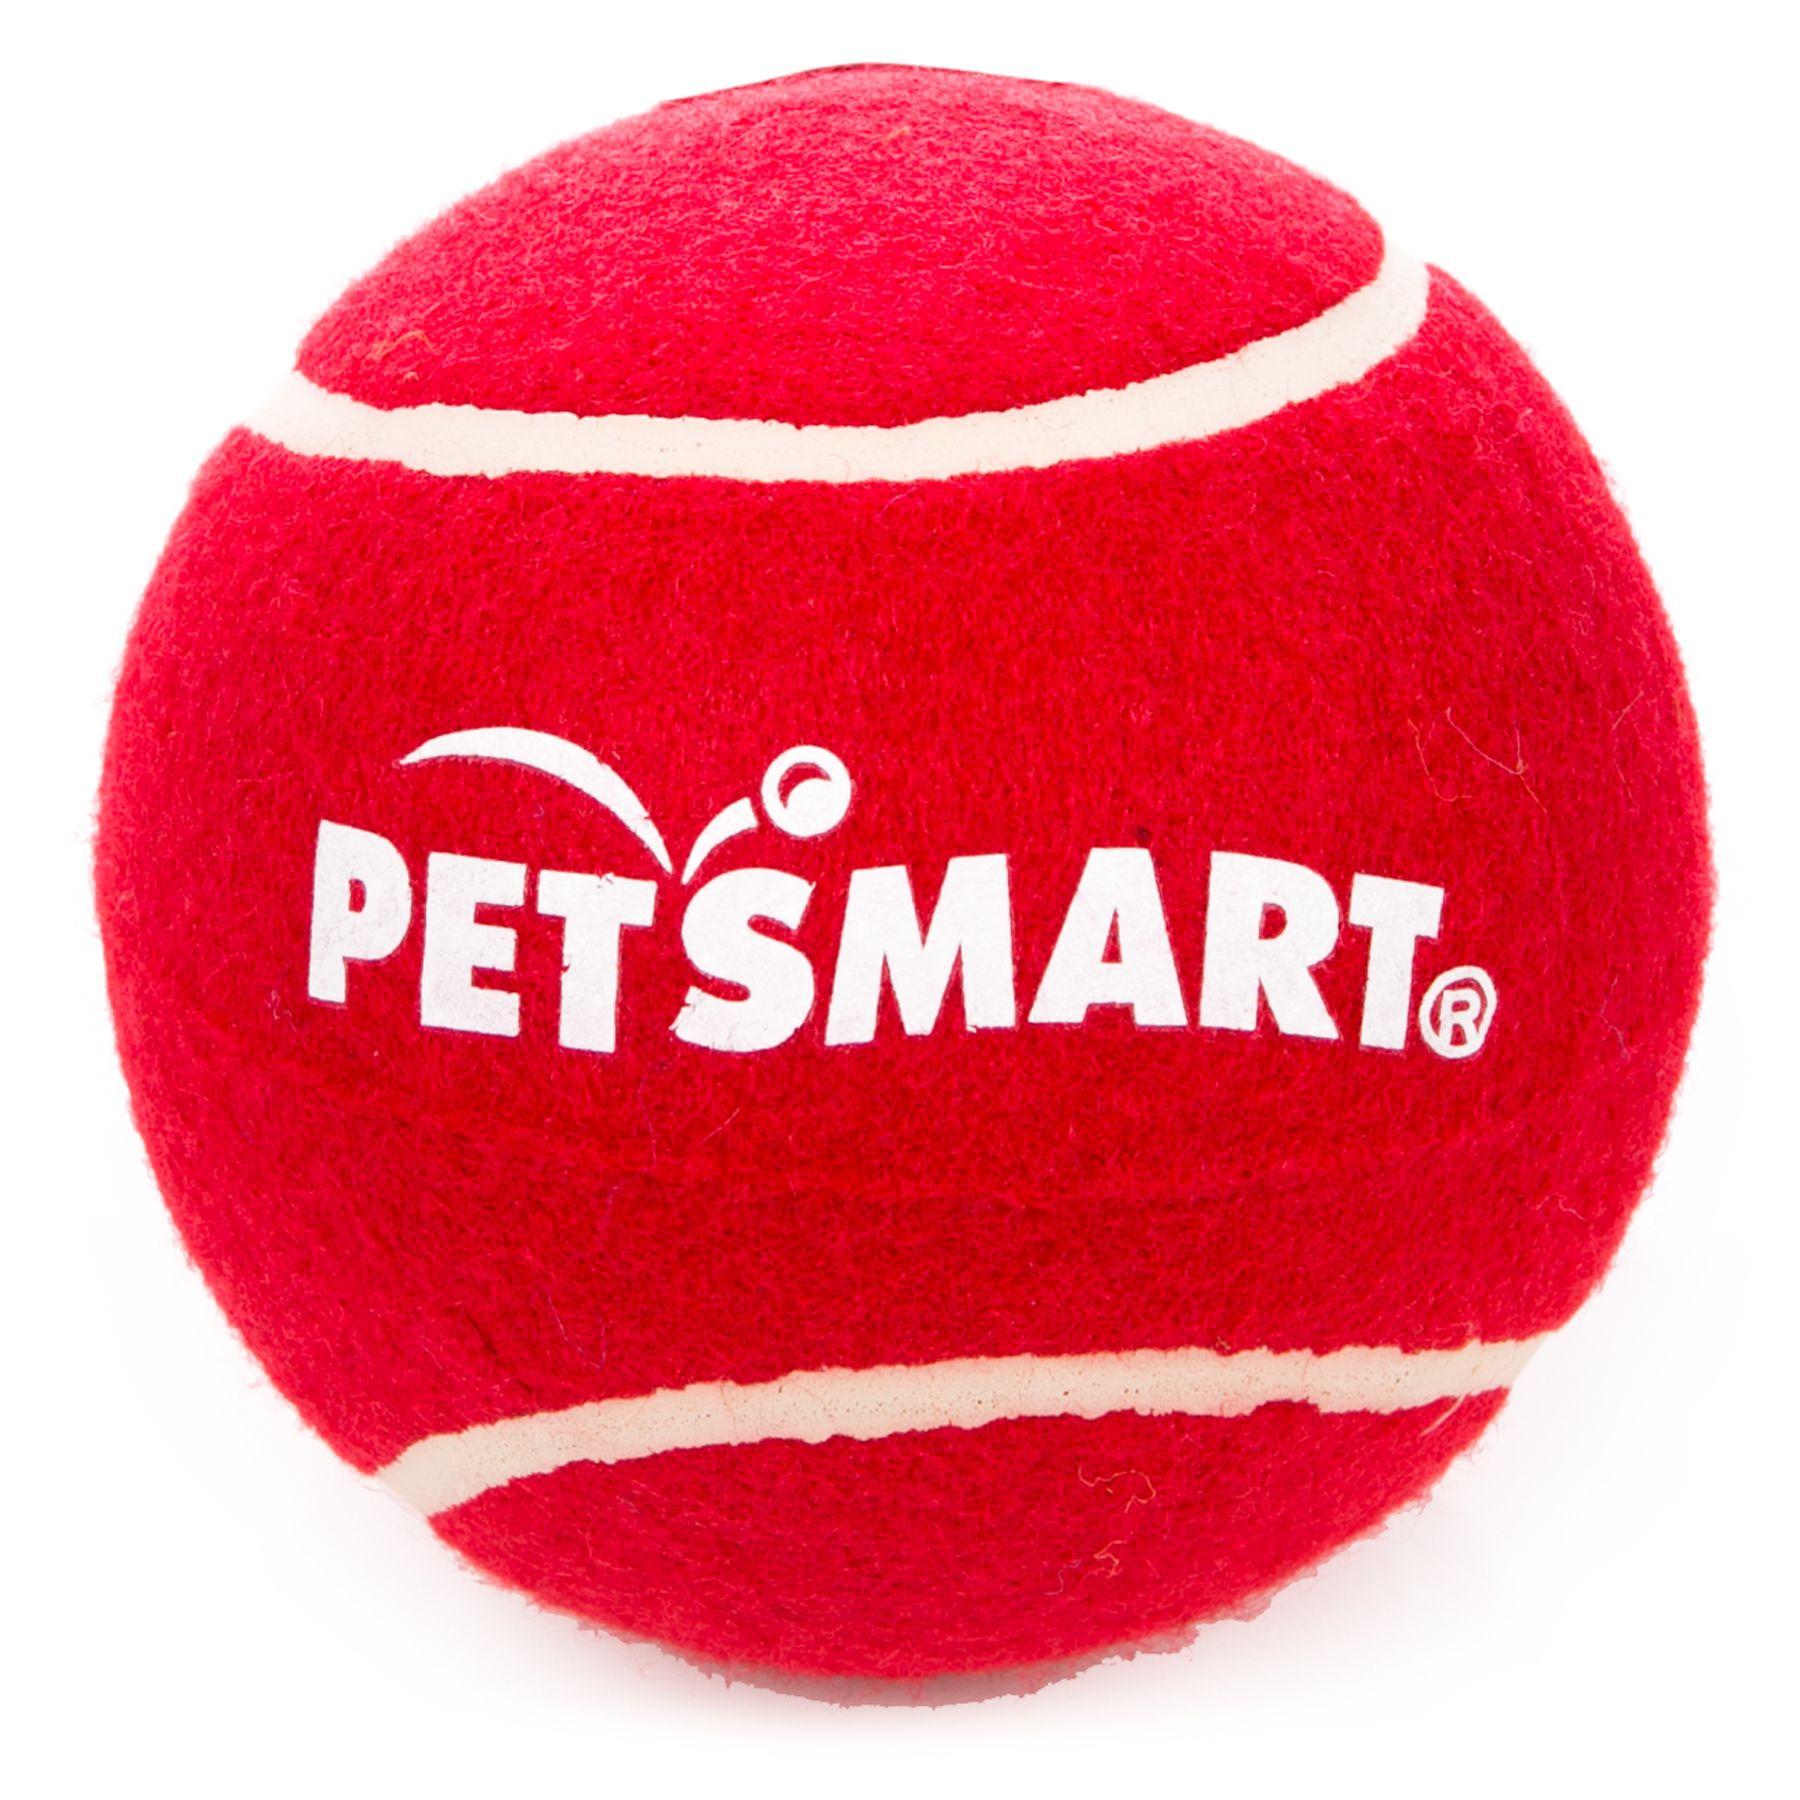 Grreat Choice Petsmart Giant Tennis Ball Red